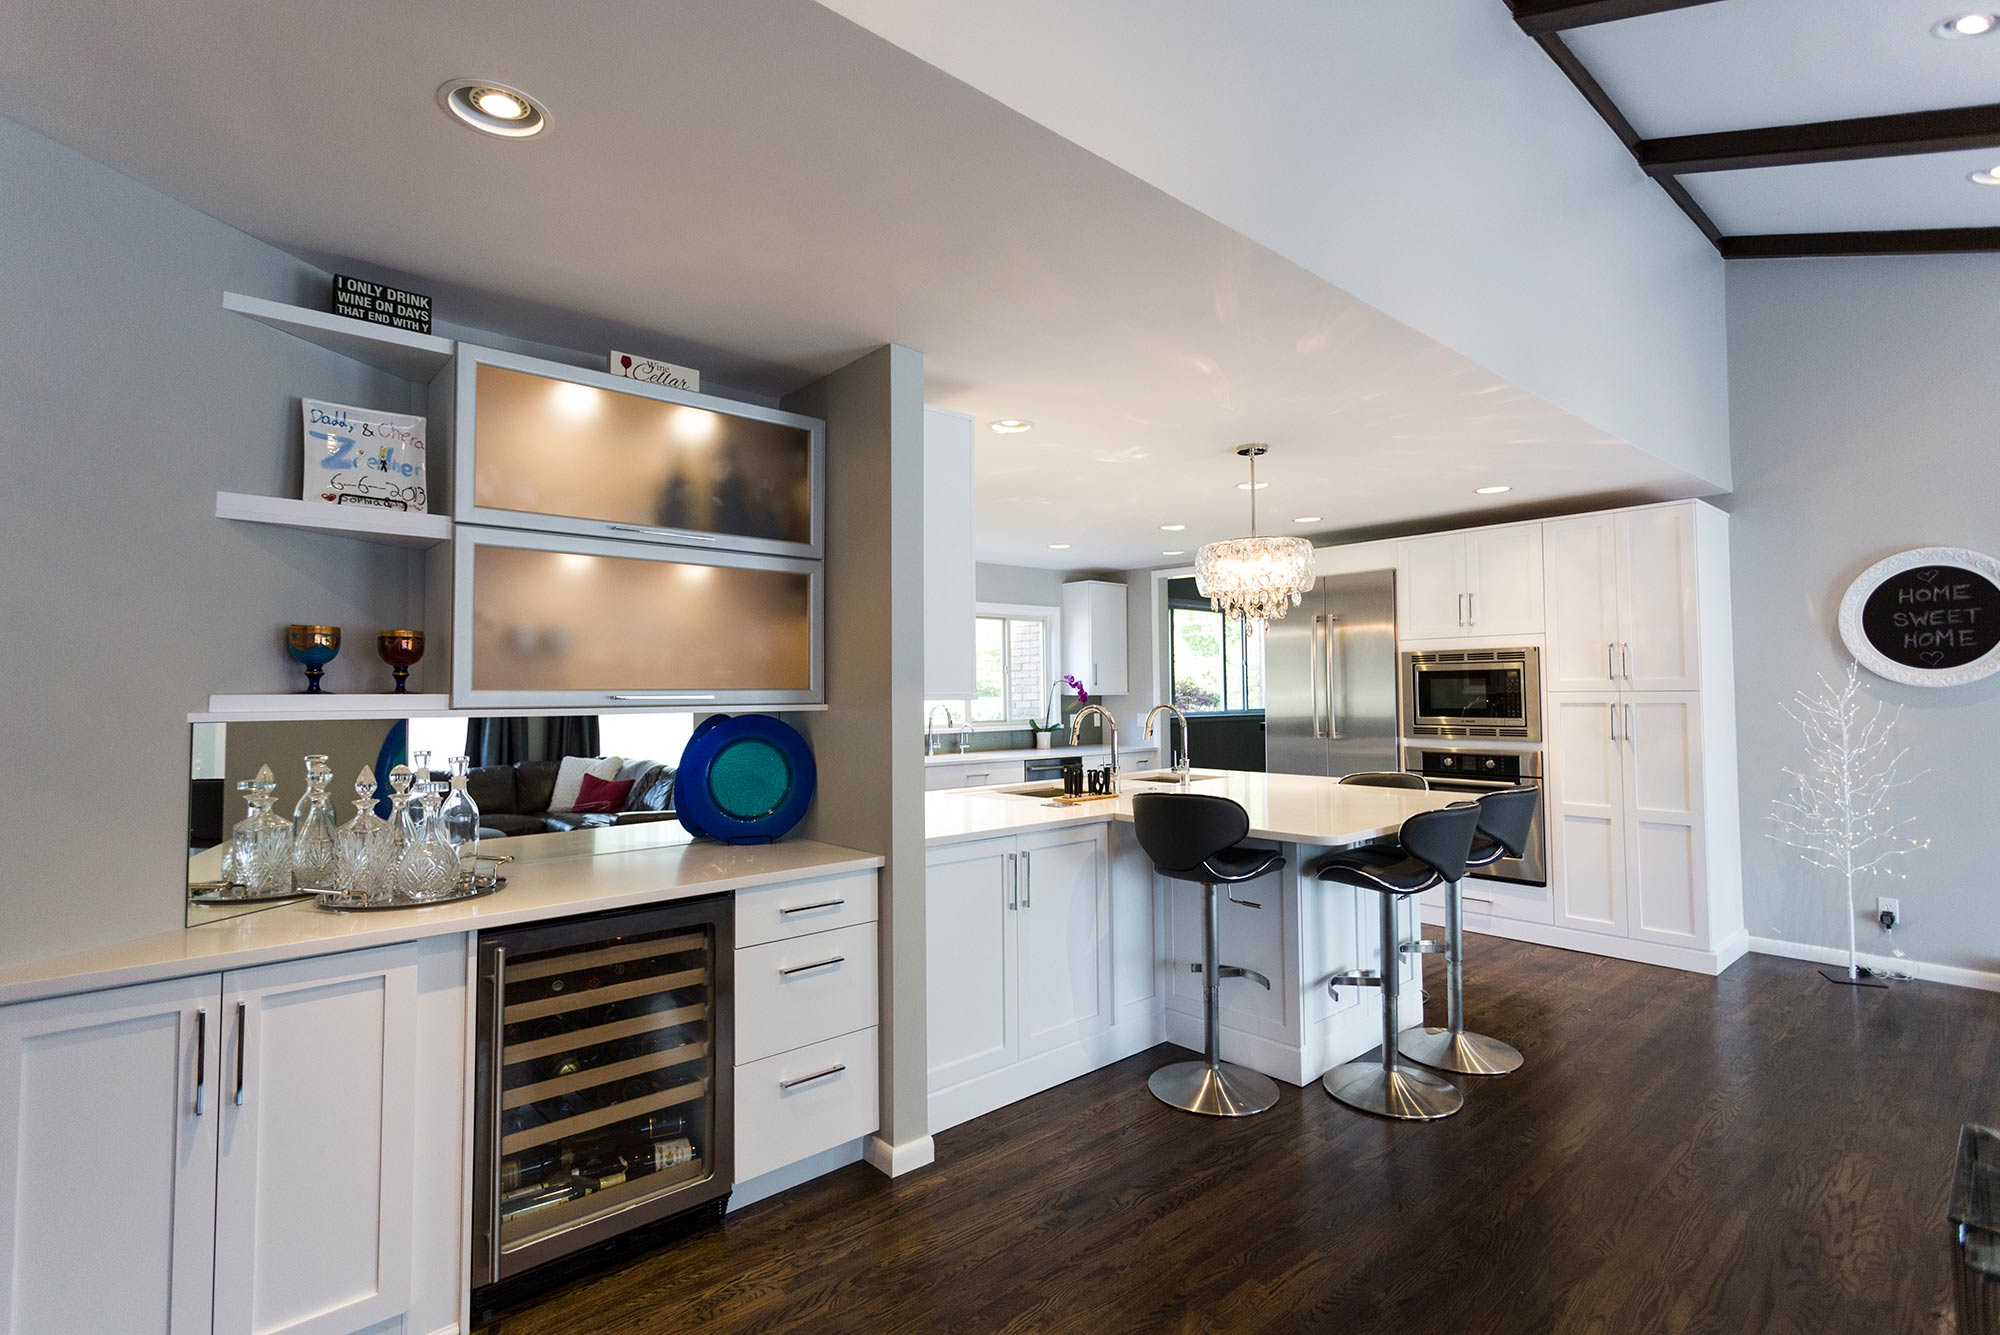 Tulsa Kitchen Cabinets Cfcpoland & Kitchen Cabinets Tulsa | 50 Inspiring Granite Countertops Tulsa ...